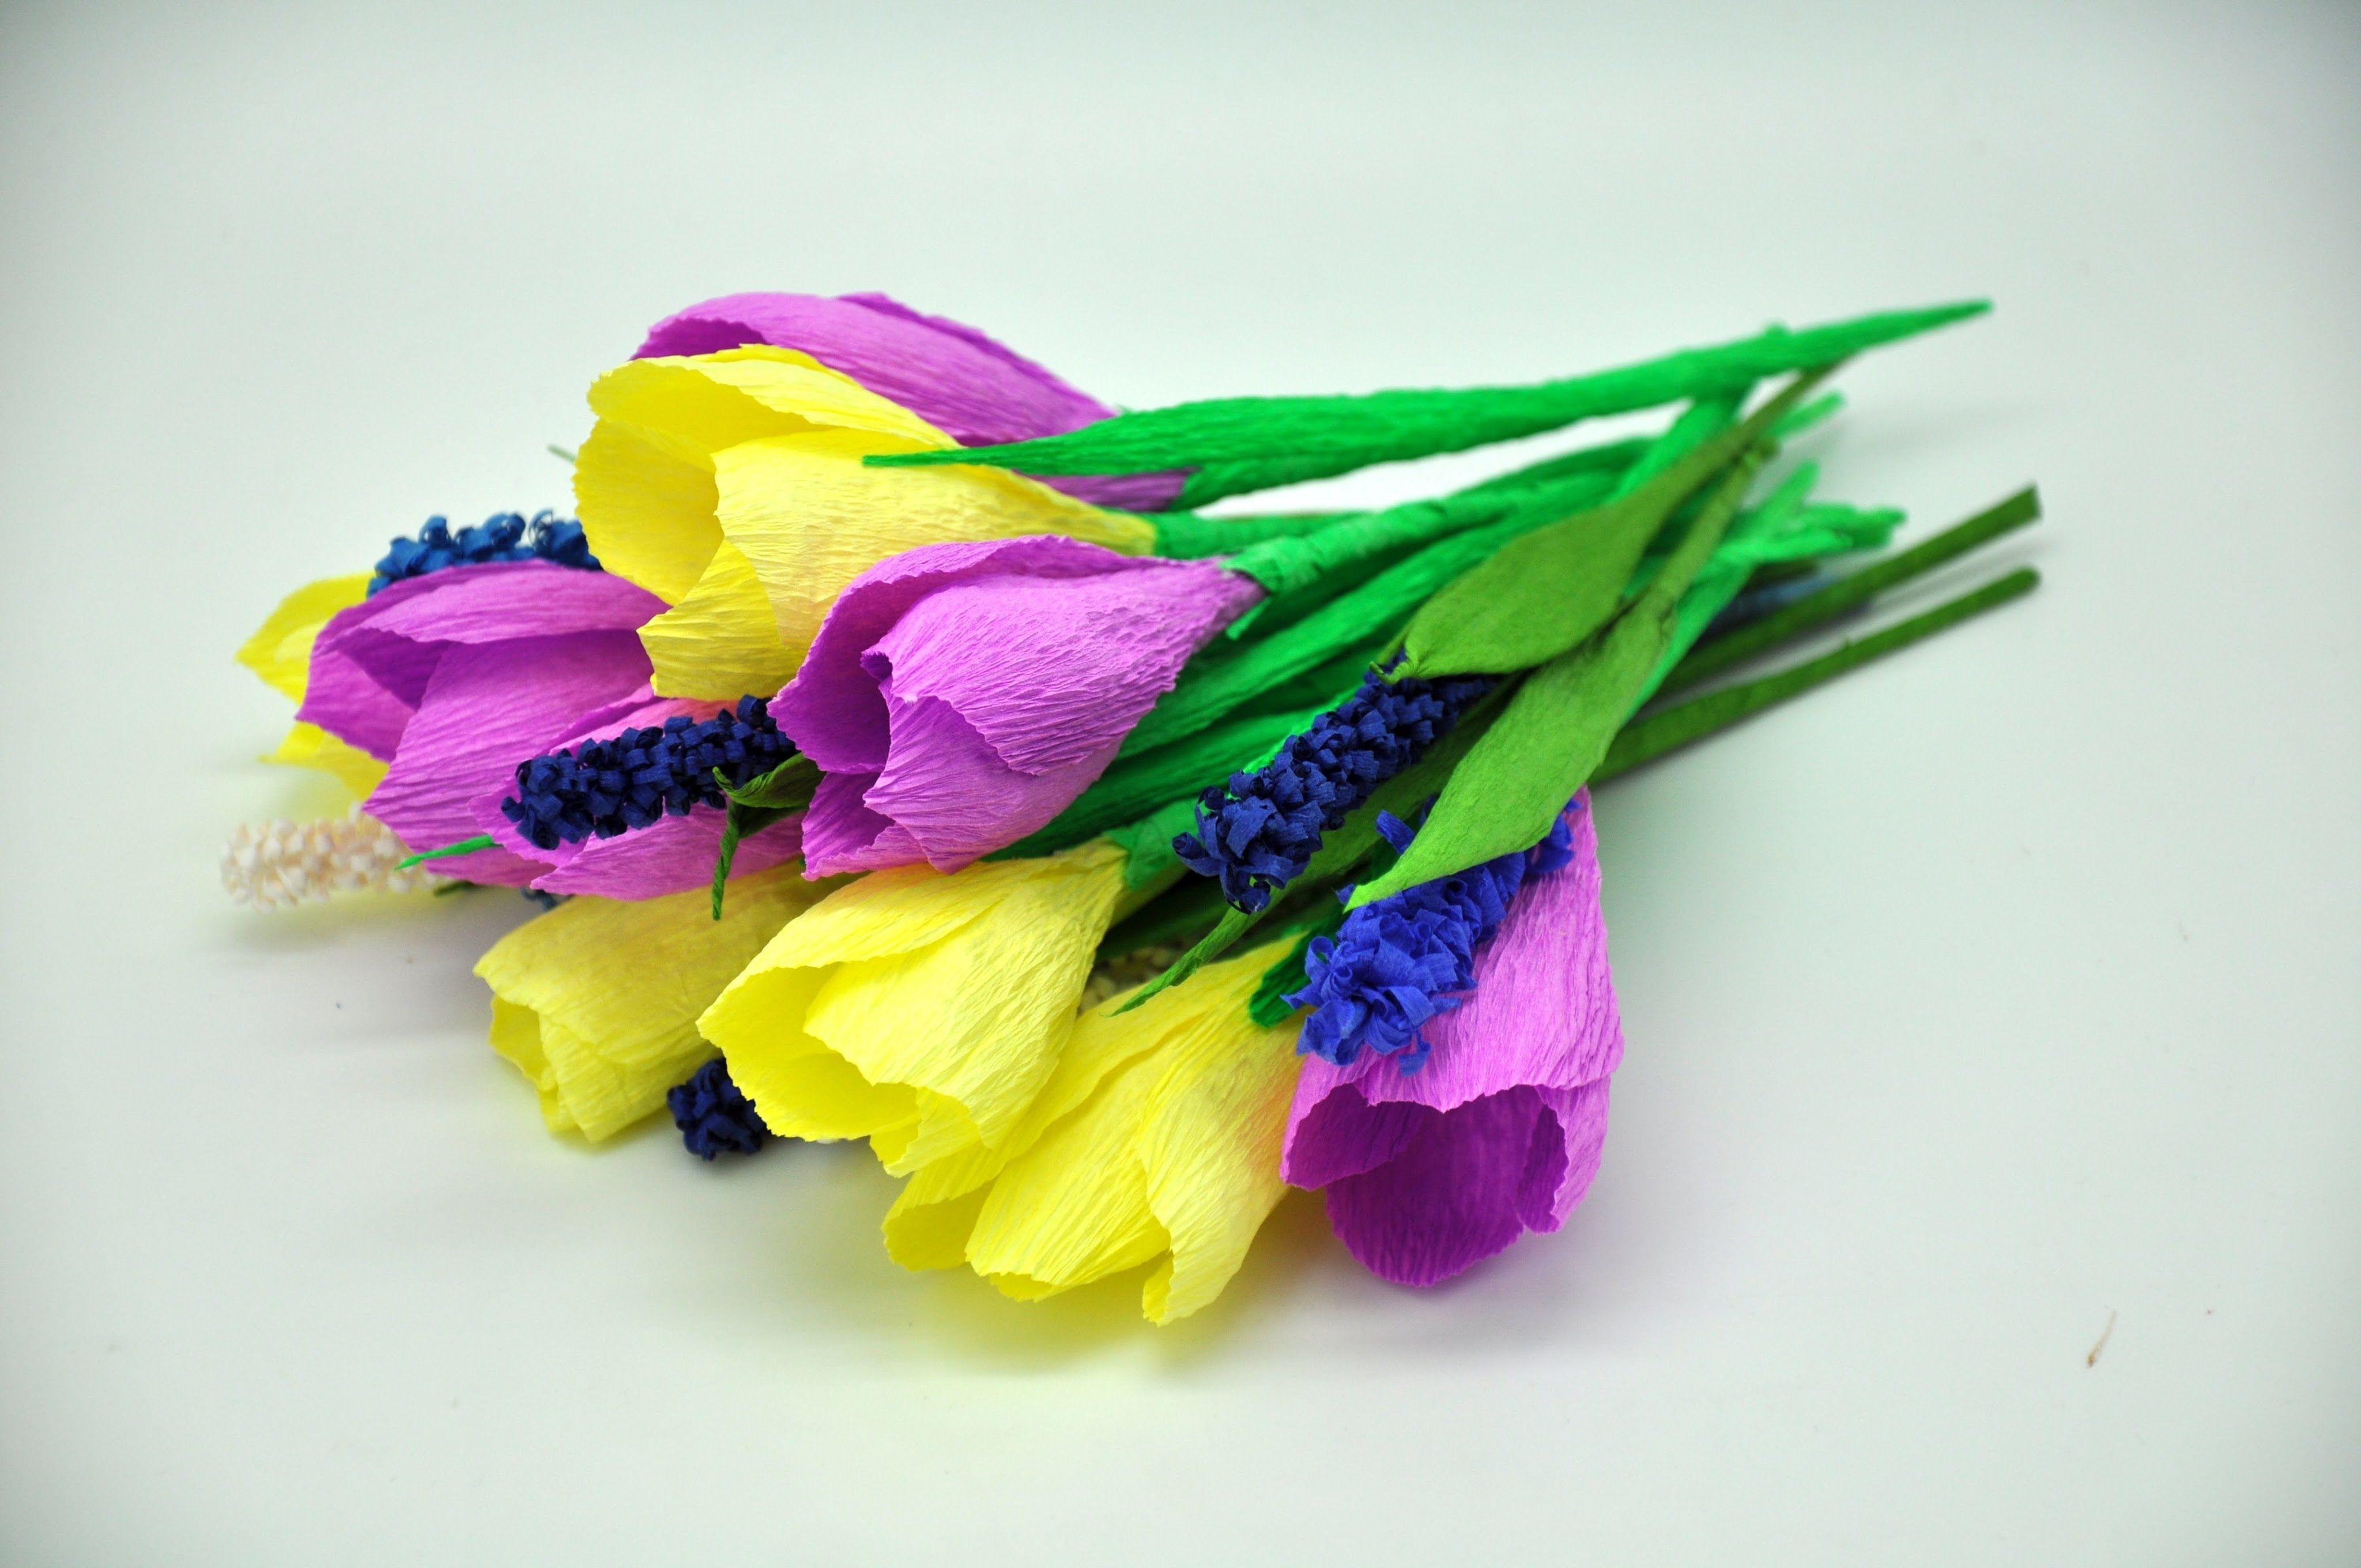 Jak Zrobic Krokusy Z Bibuly How To Make Crepe Crocuses Diy Diy Flowers Crepe Paper How To Make Crepe